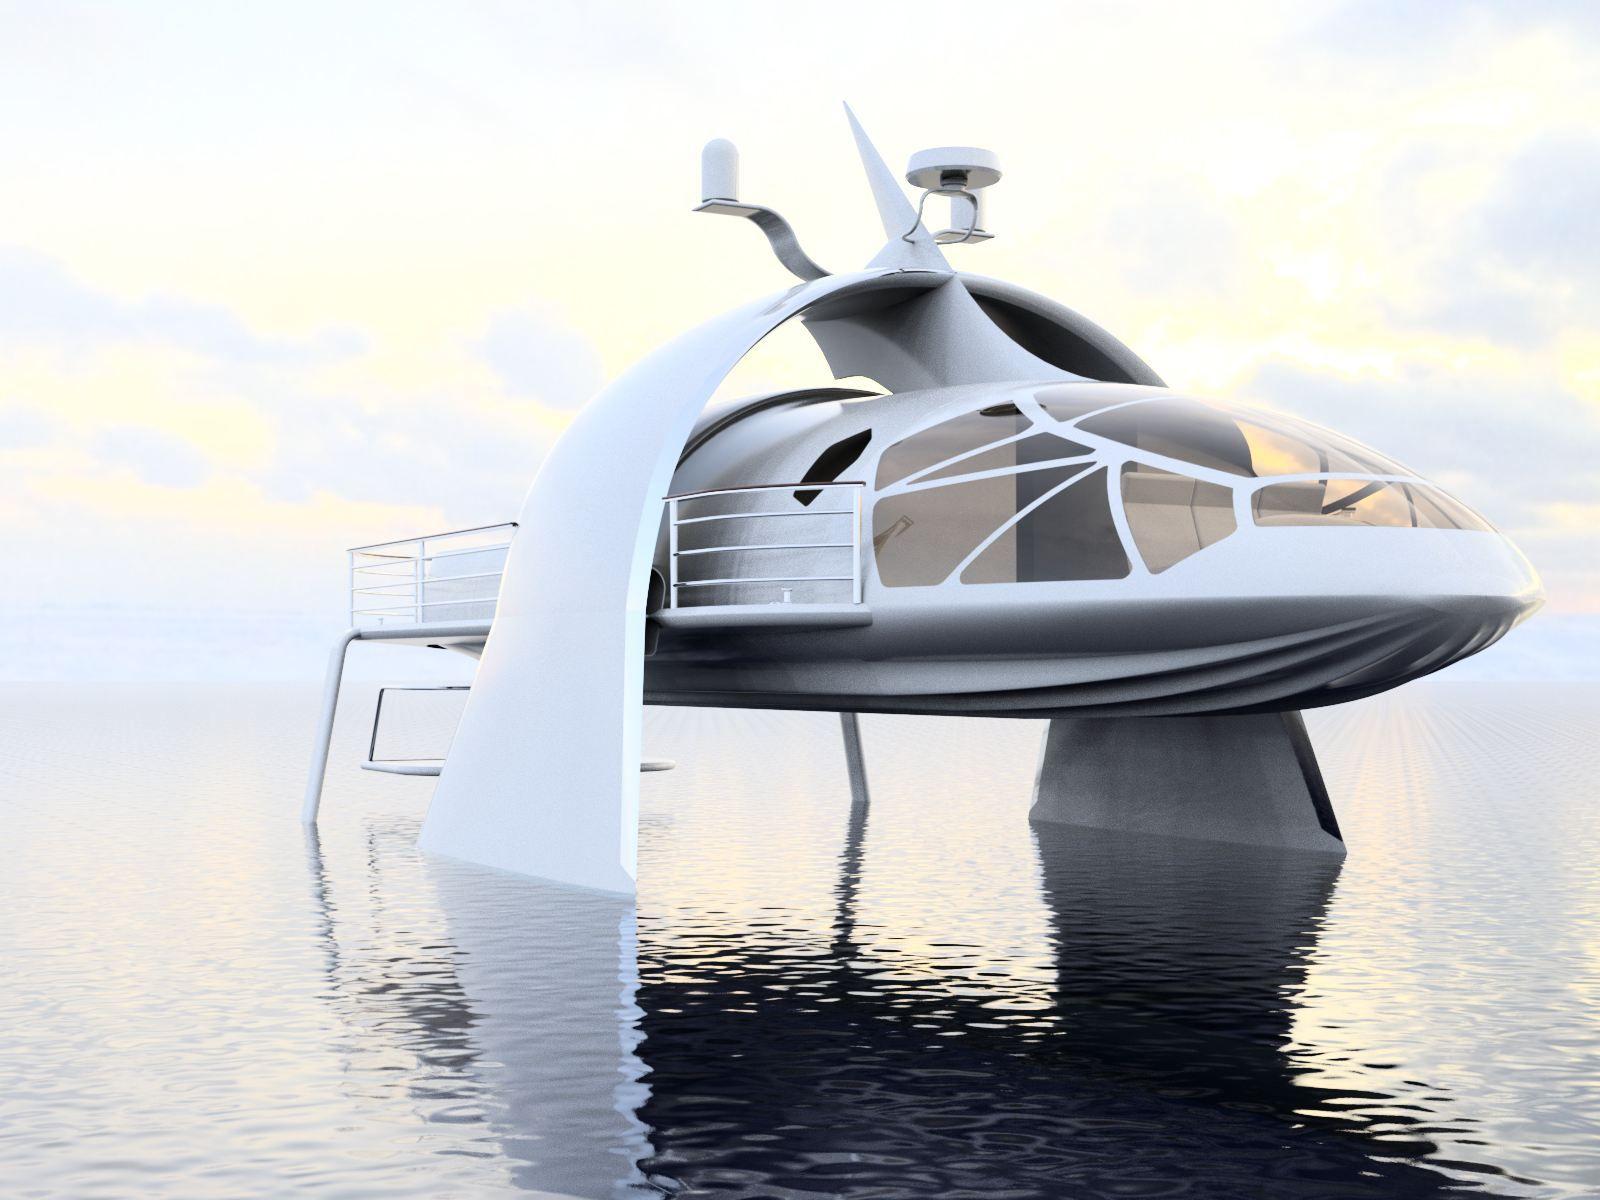 Trilobite swath yacht design concept autodesk online gallery for Yacht dekoration